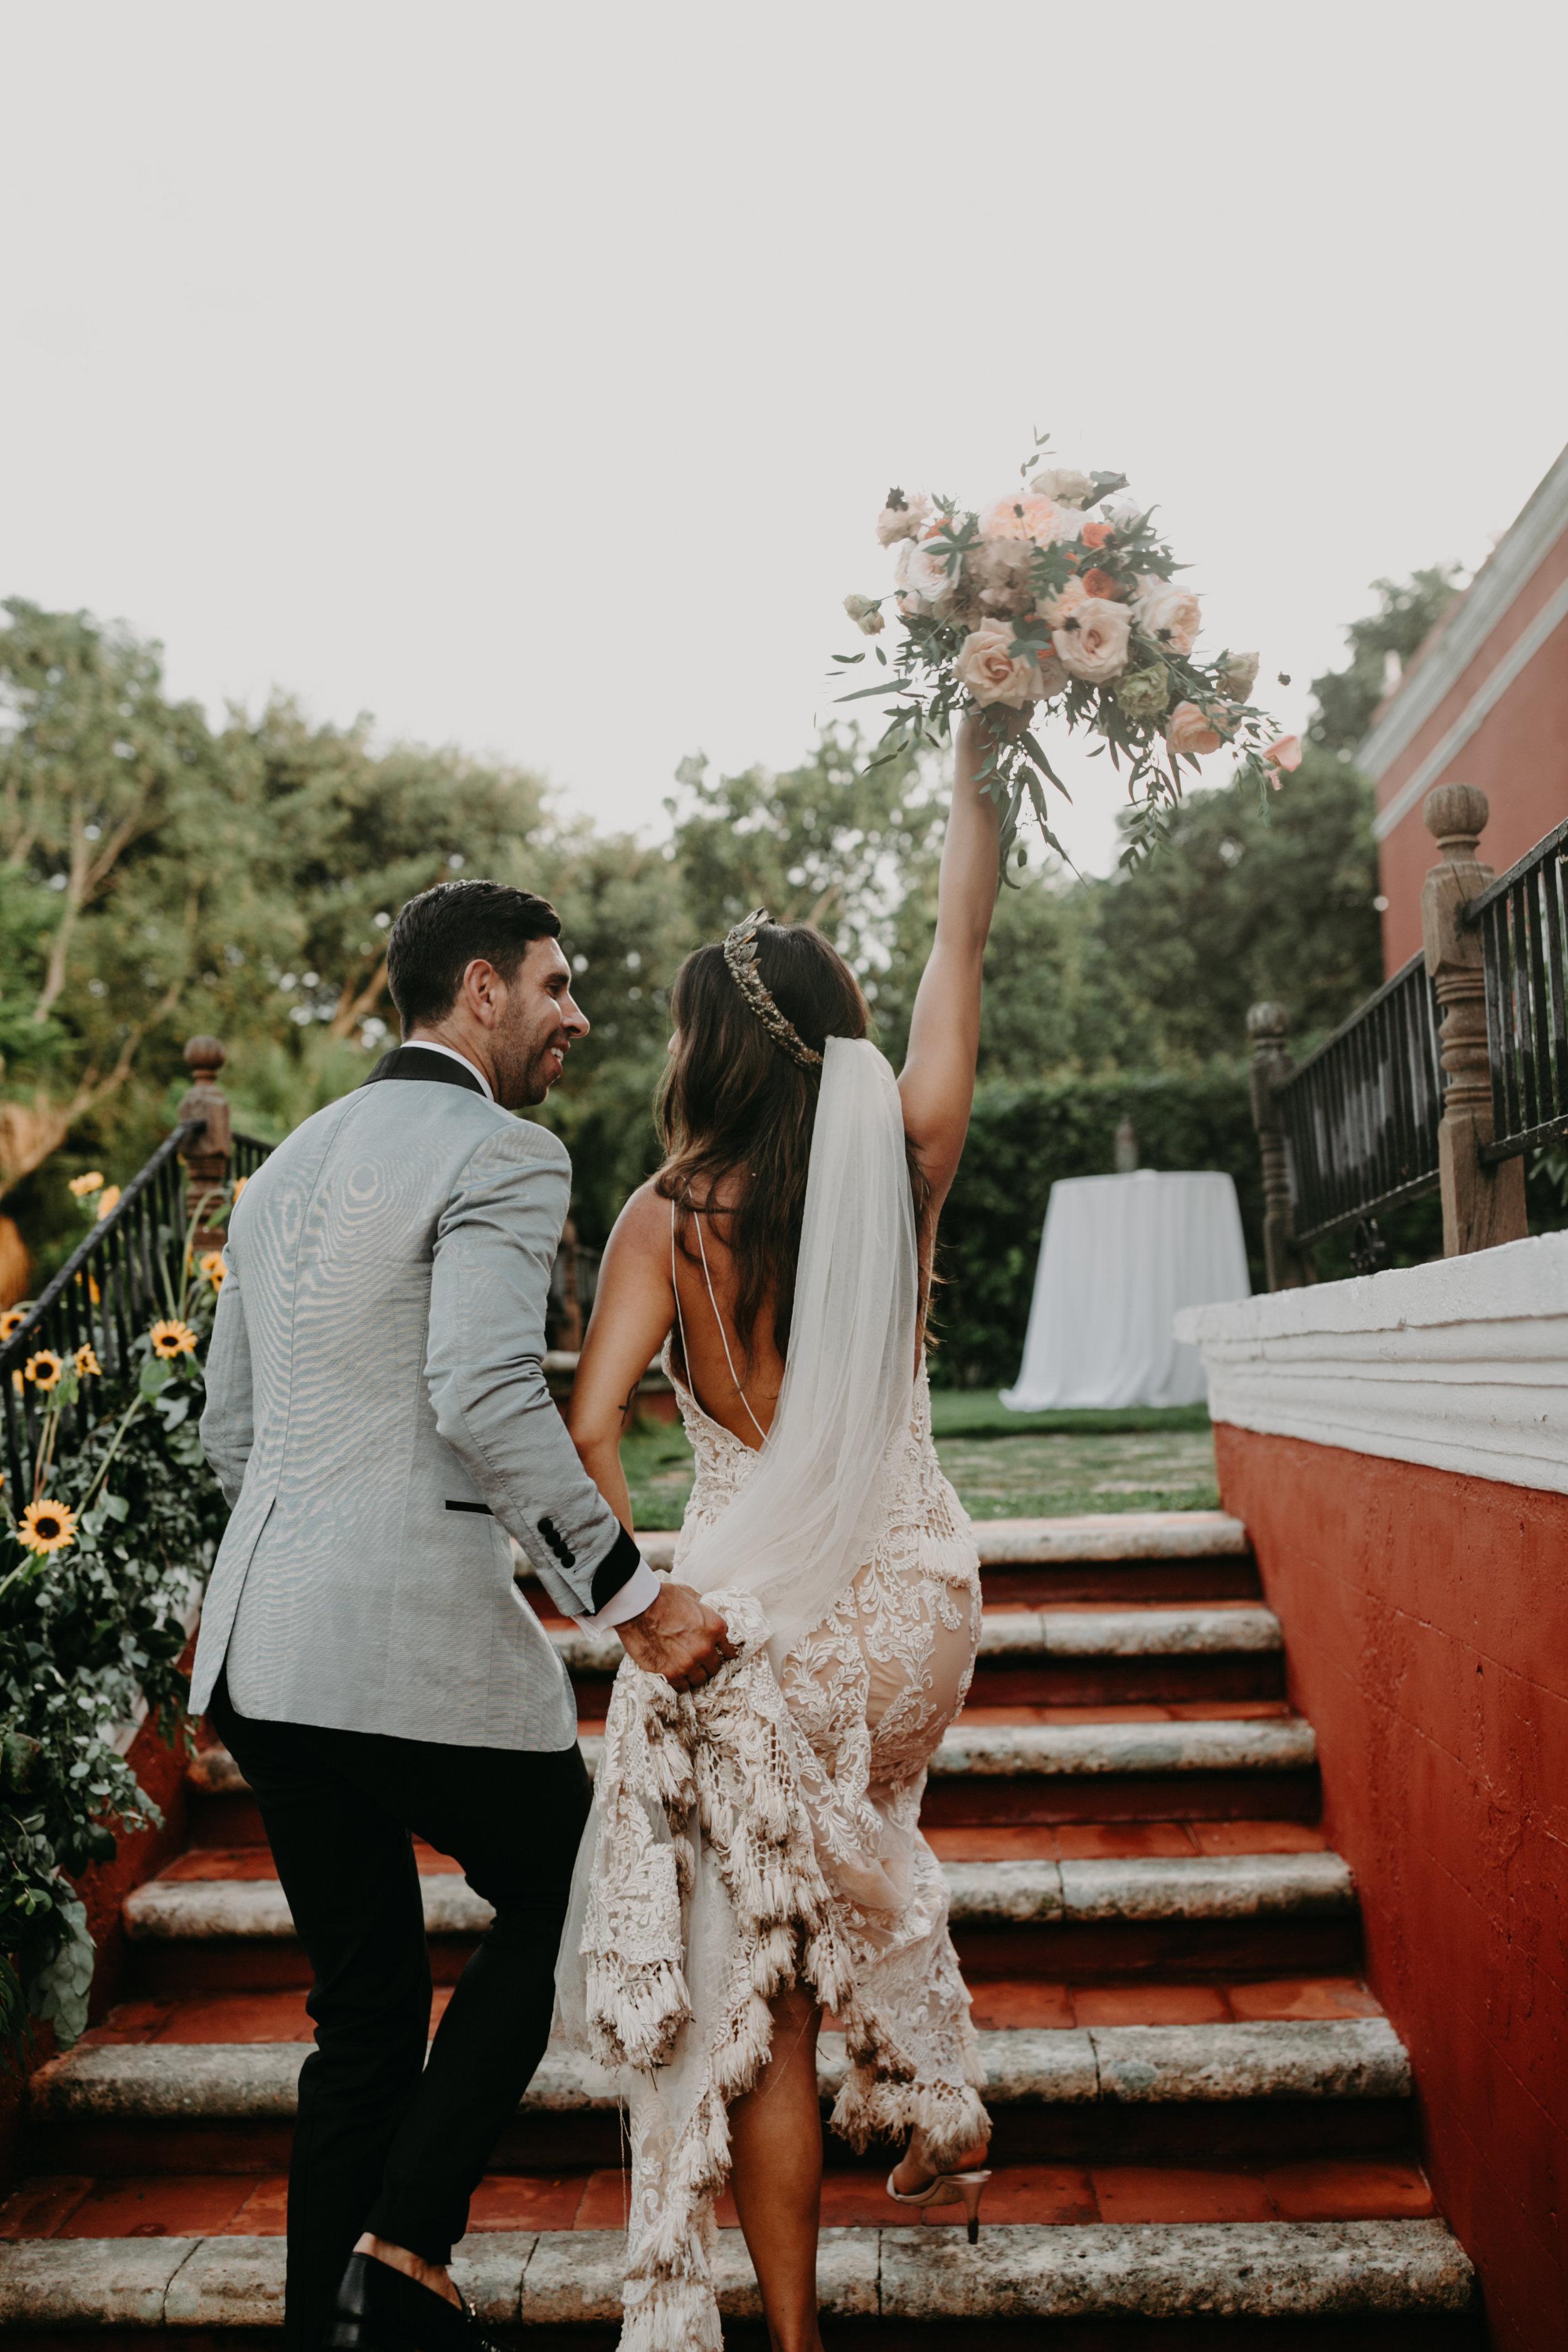 Hacienda Temozon Yucatan Mexico Wedding | Ida & Peter Emily Magers Photography-1120.jpg